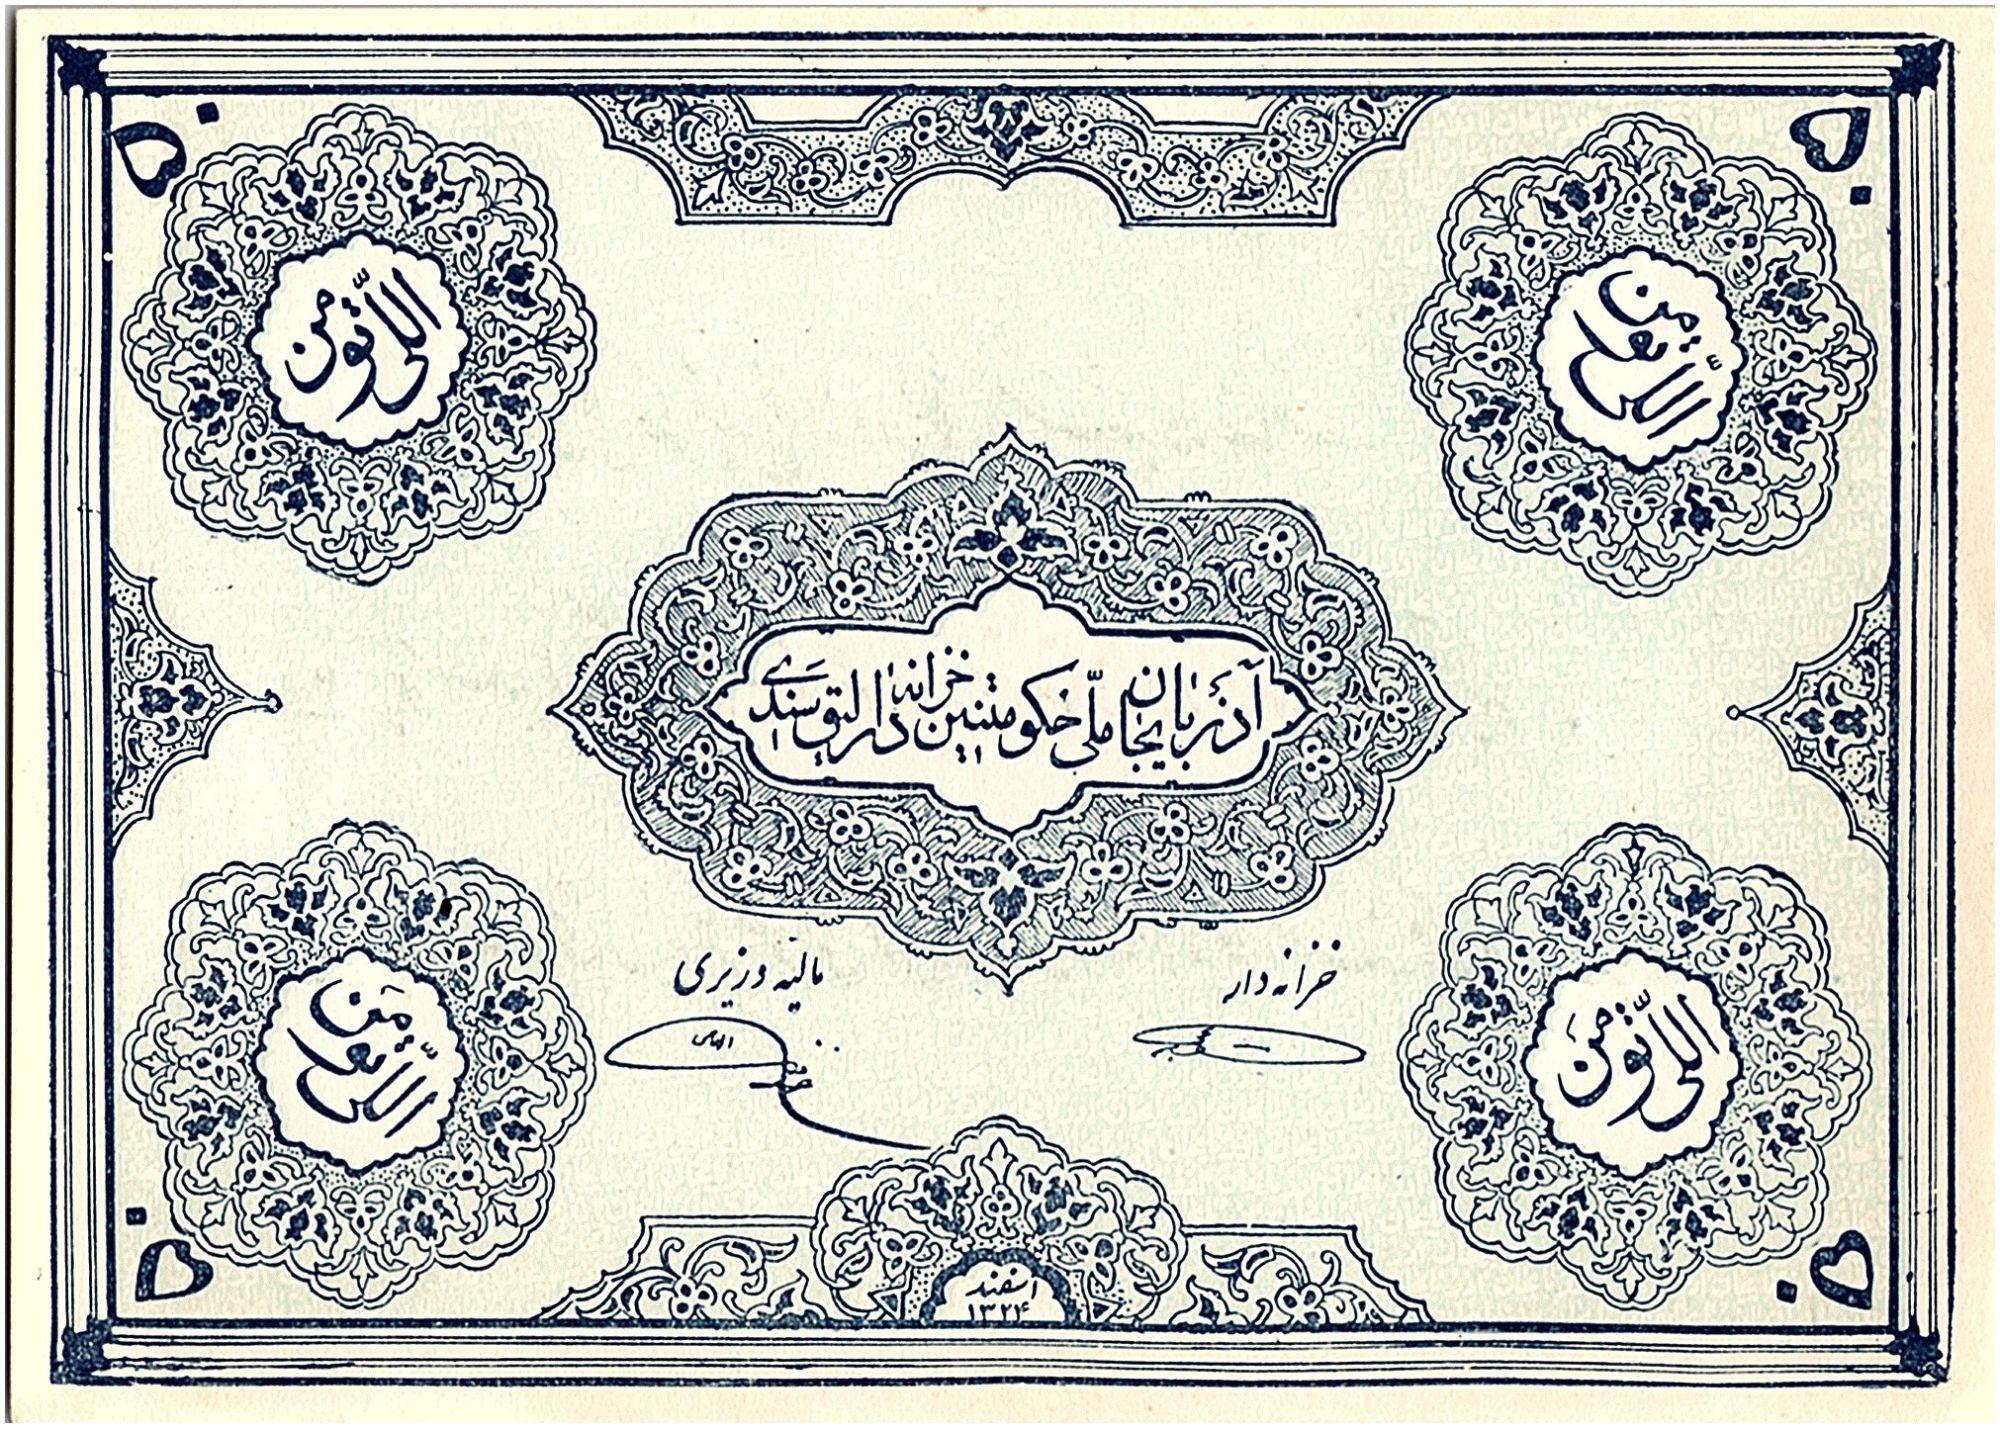 Azerbaidjan 50 Tomans  - Dessin oriental - 1946